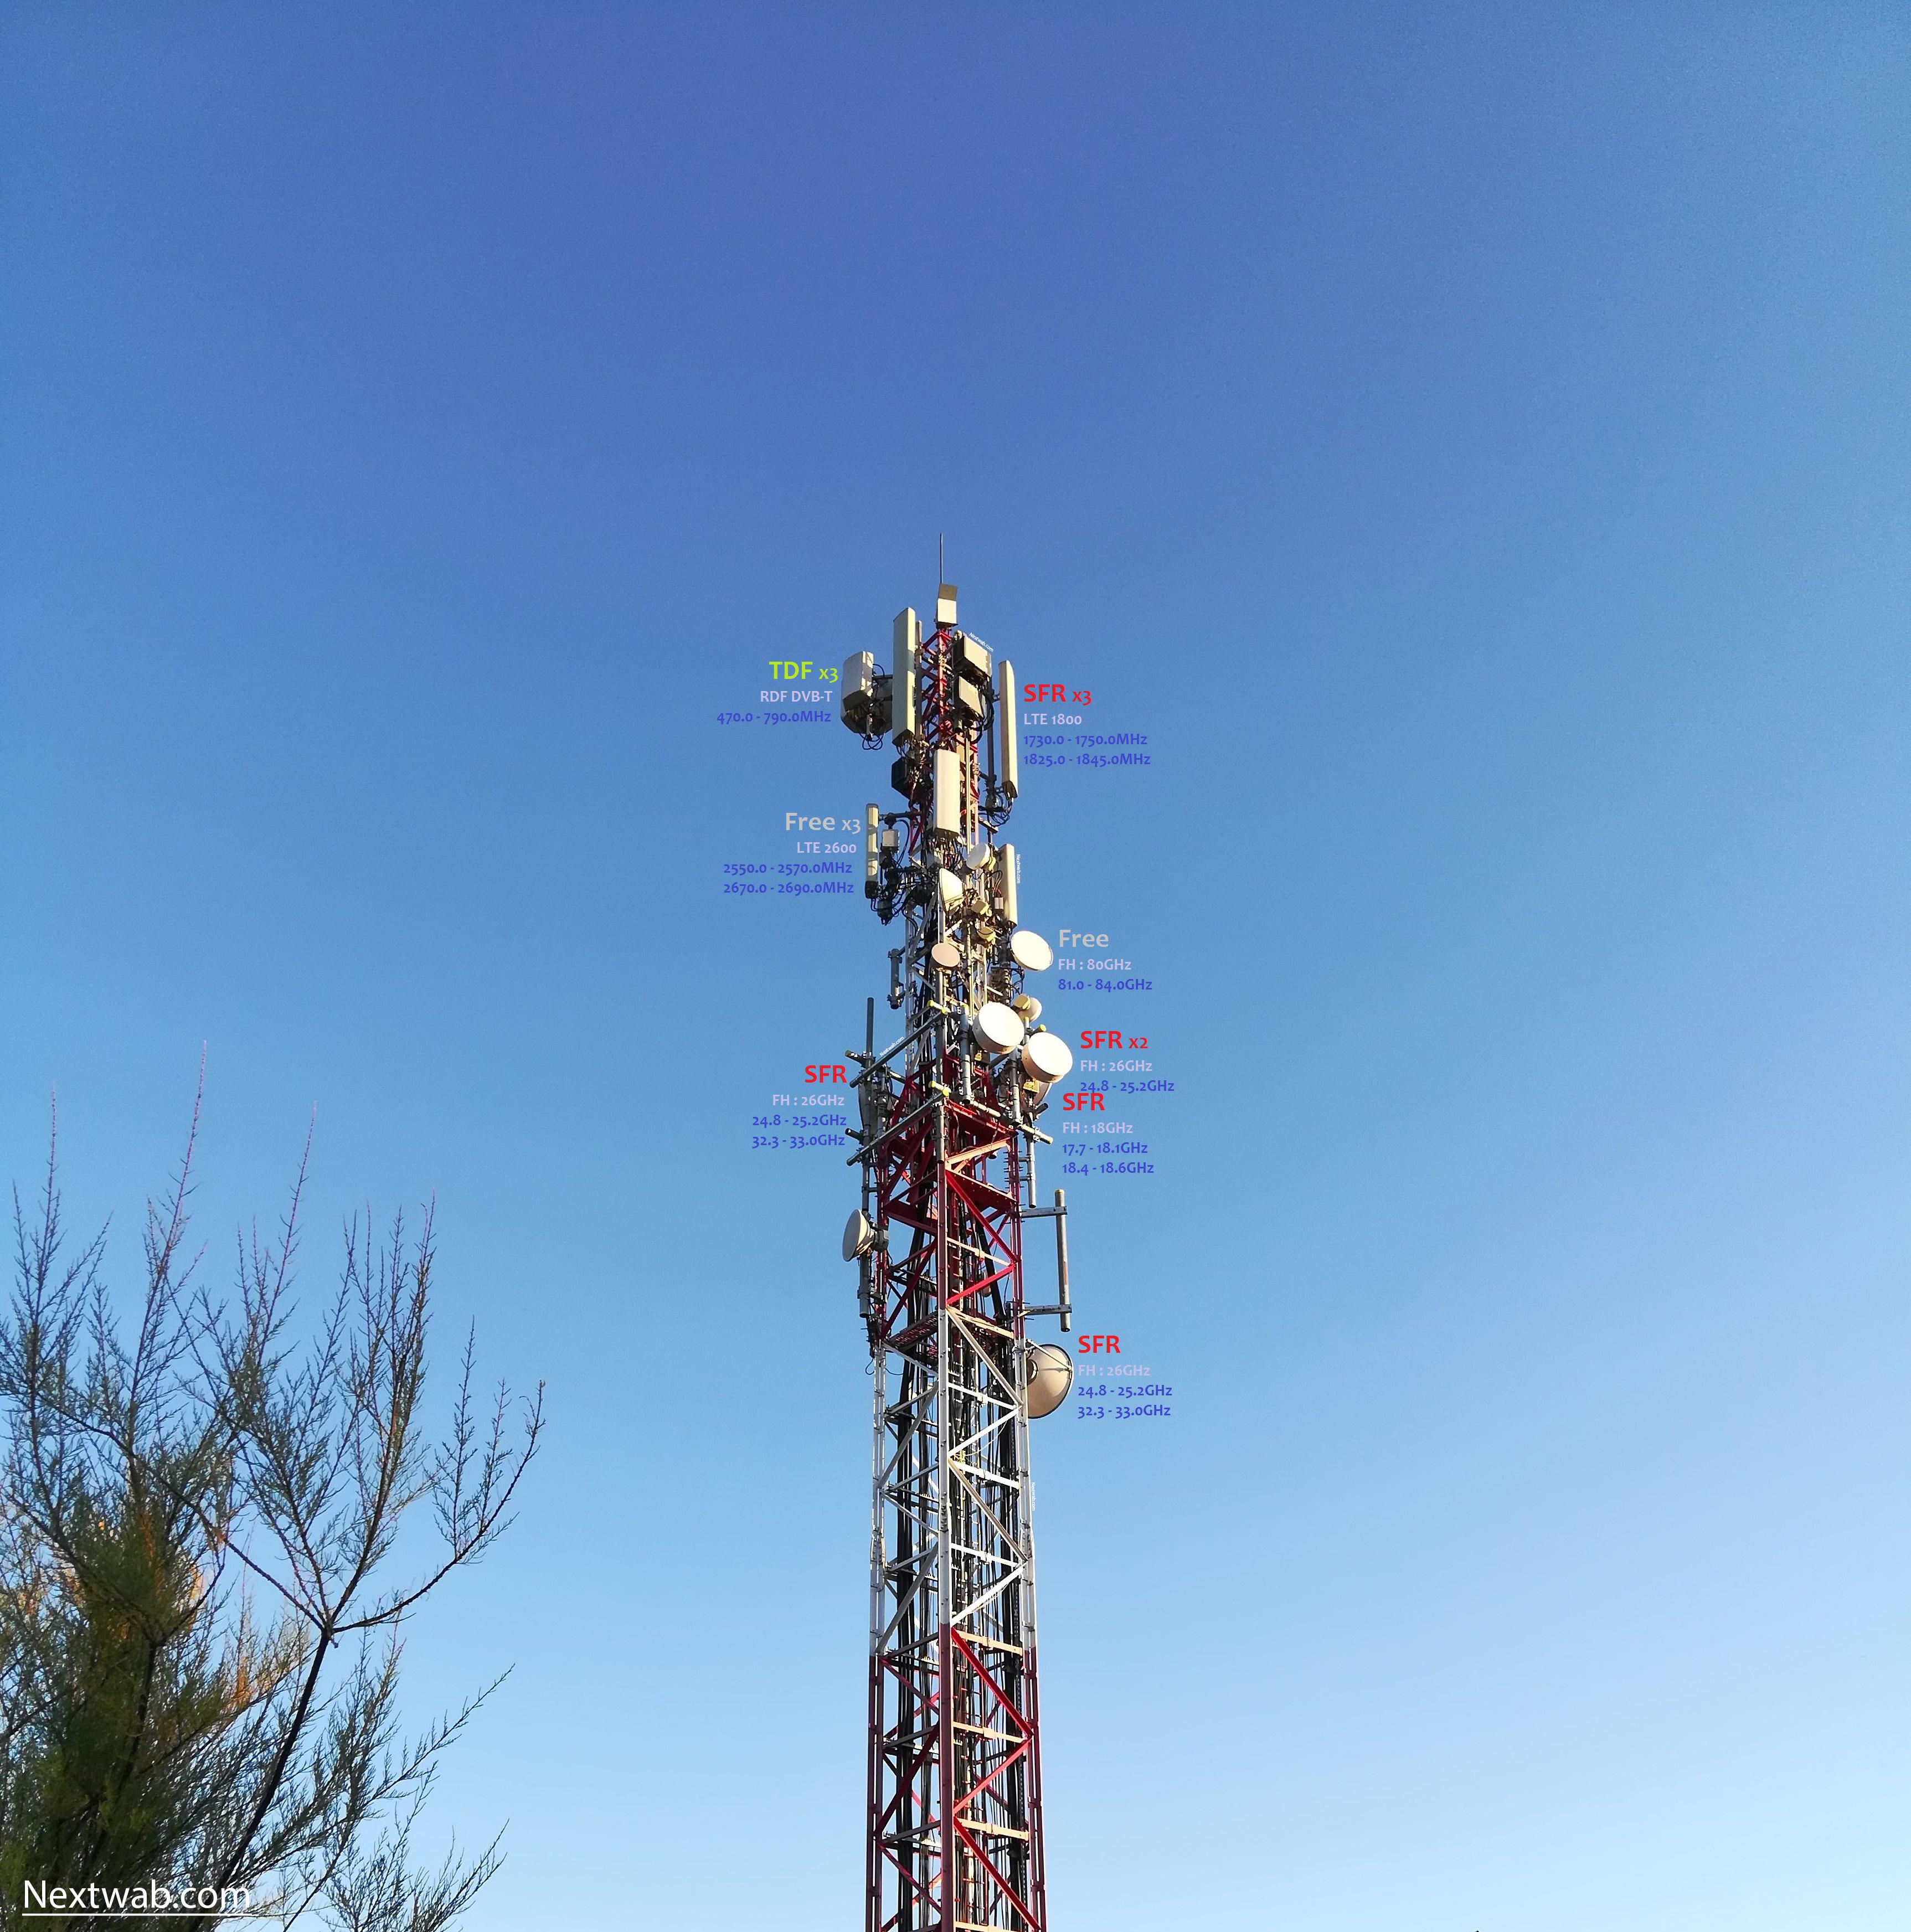 (Légende) Antenne Relais TDF, SFR, Free et Orange (Pylône Autostable) : TV, Radio, FH, 4G